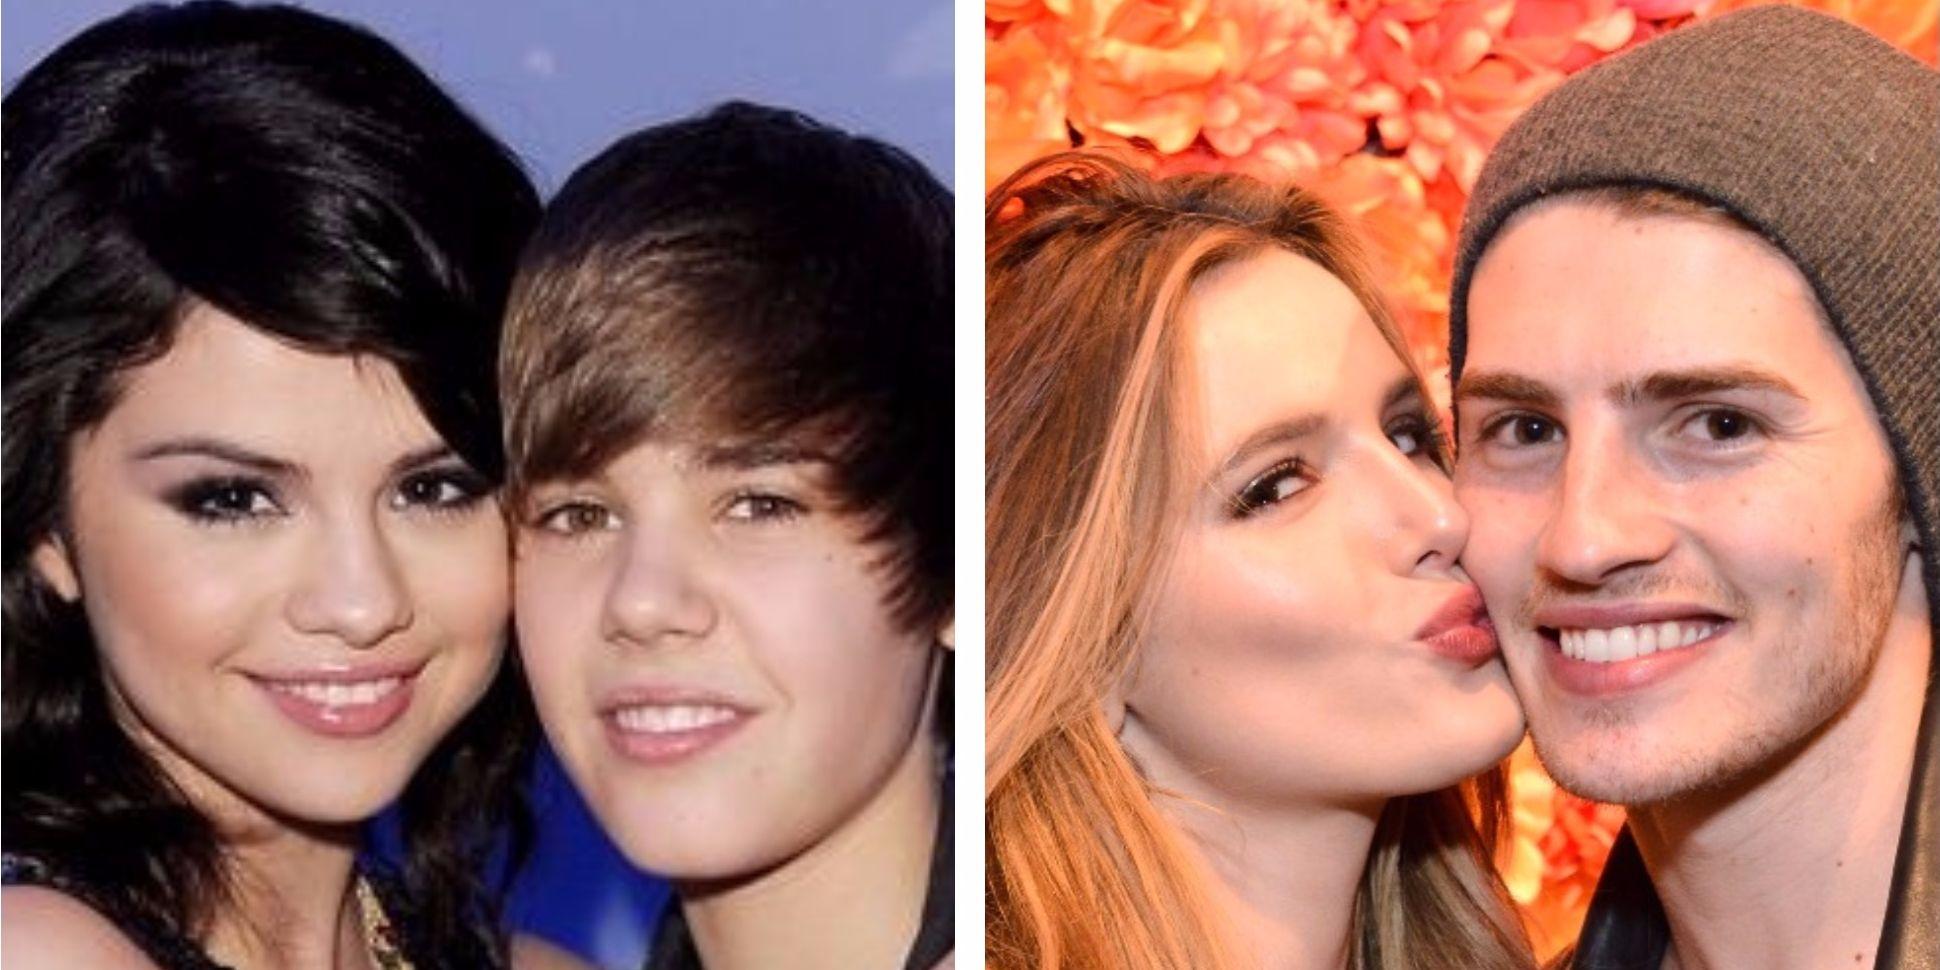 Selena Gomez and Justin Bieber, Bella Thorne and Gregg Sulkin